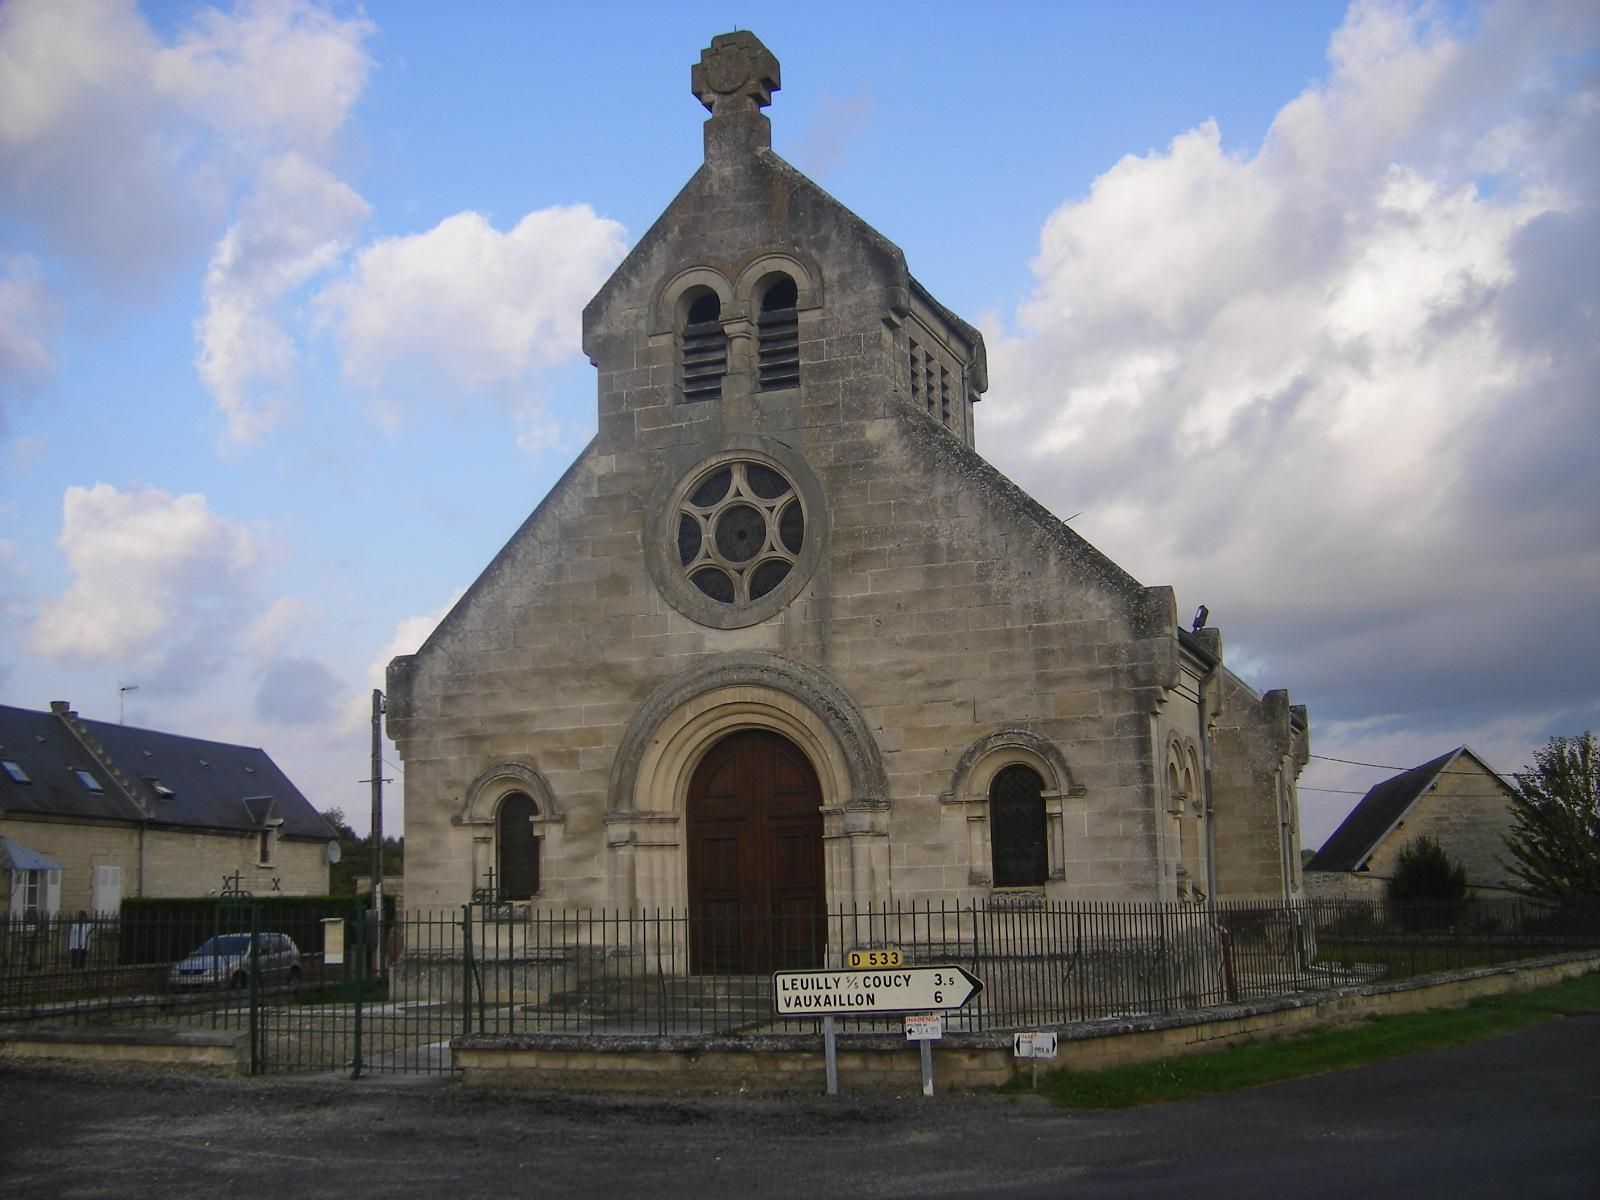 Landricourt, Aisne